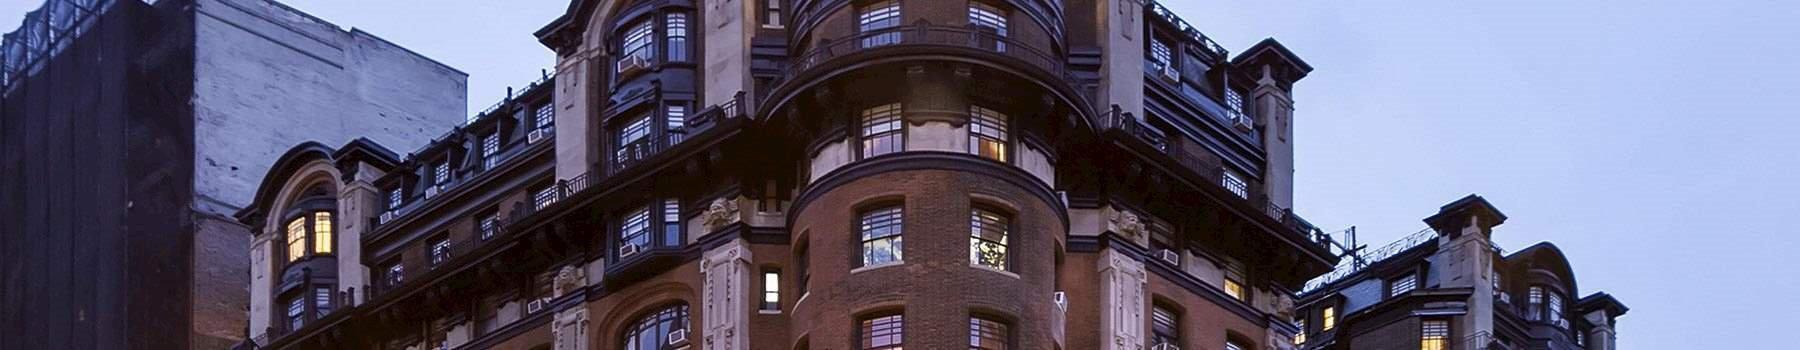 Hotel Belleclaire Best Rate Guarantee, New York